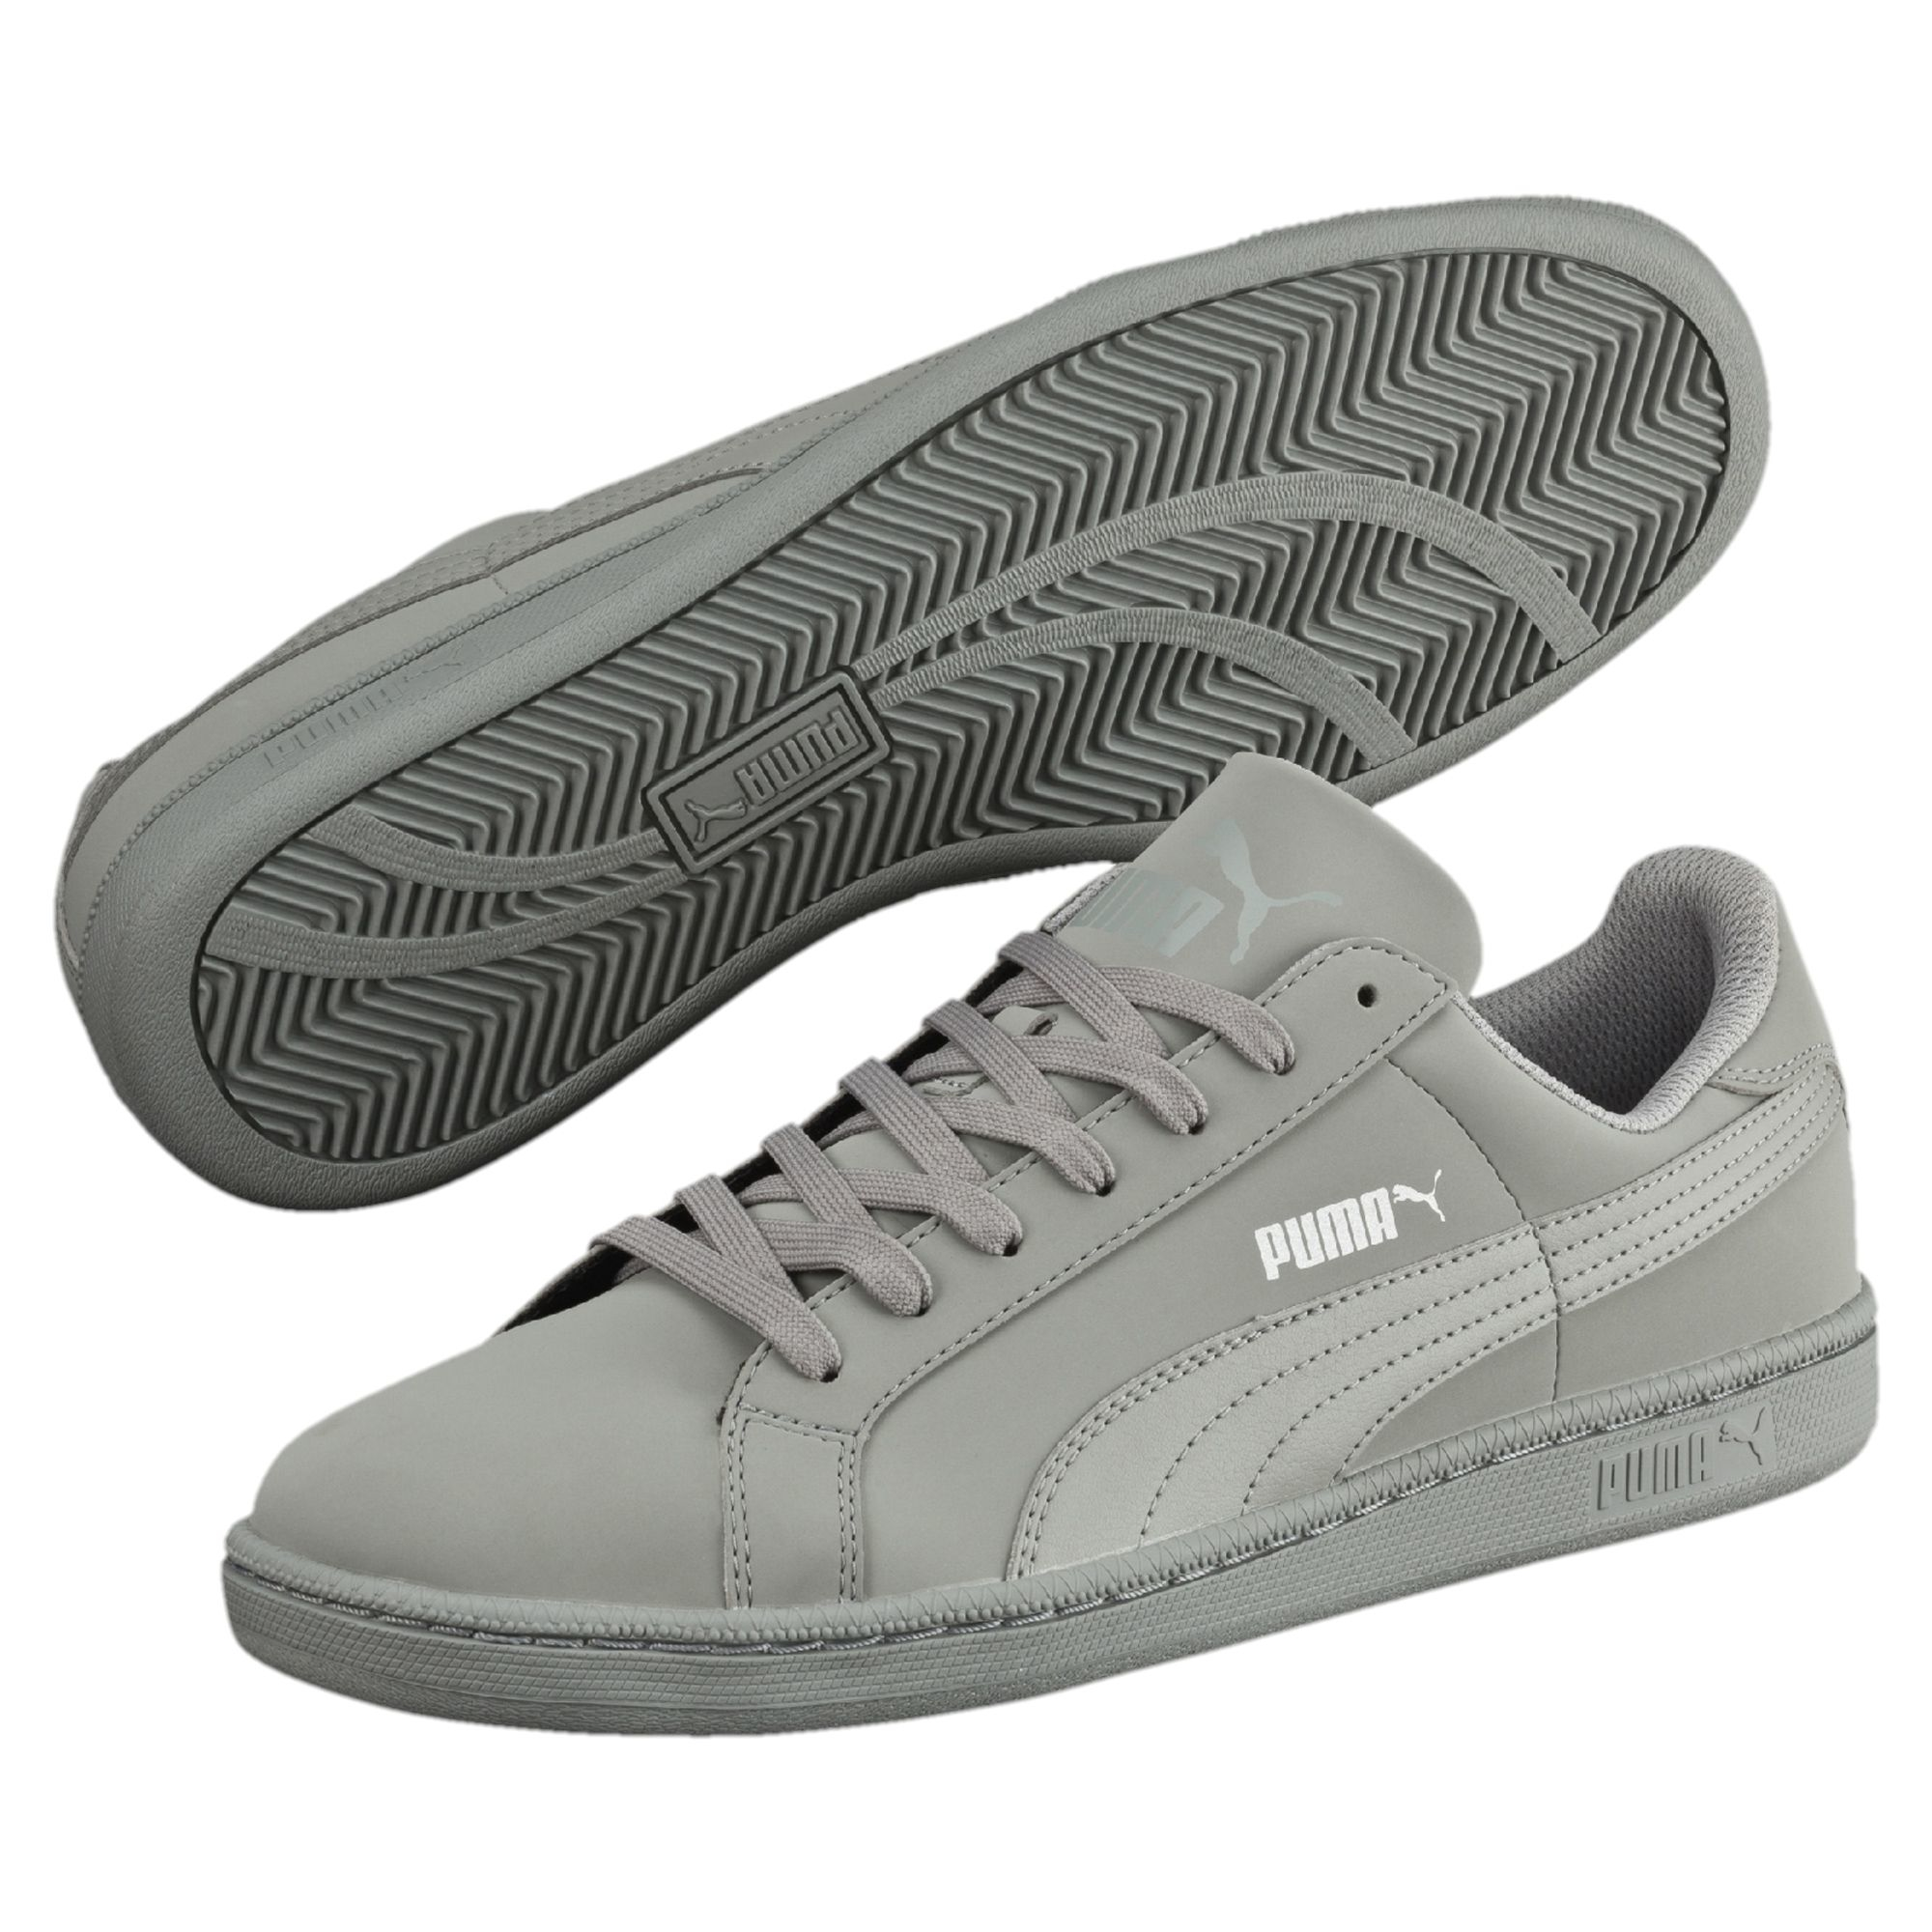 bca6d22744e Lyst - PUMA Smash Buck Men s Sneakers in Gray for Men